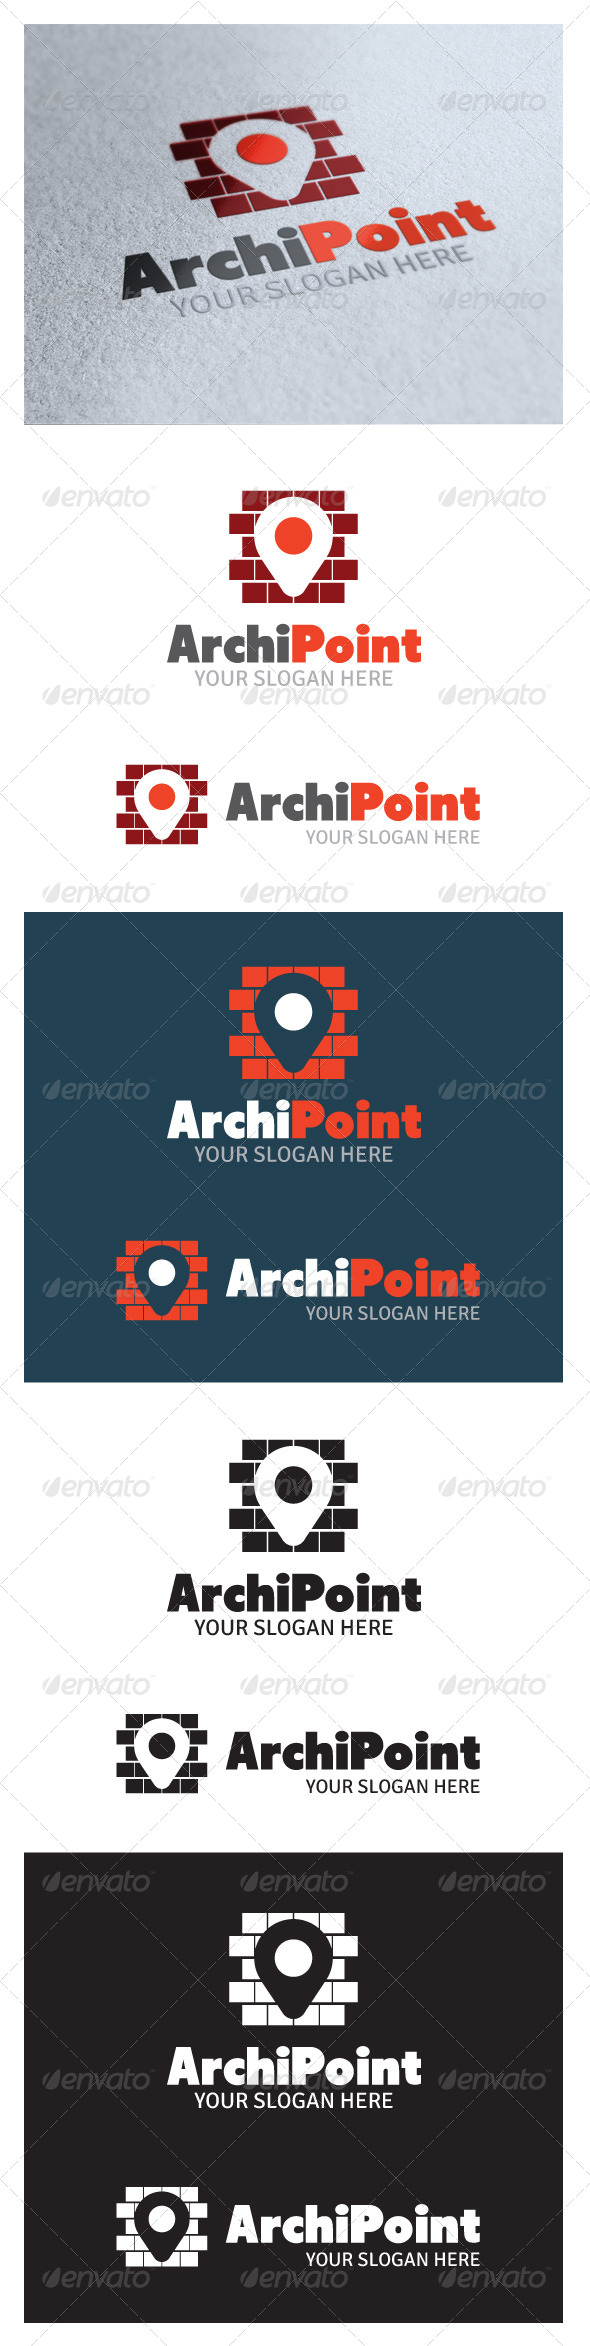 GraphicRiver Arhipoint Logo 4978341